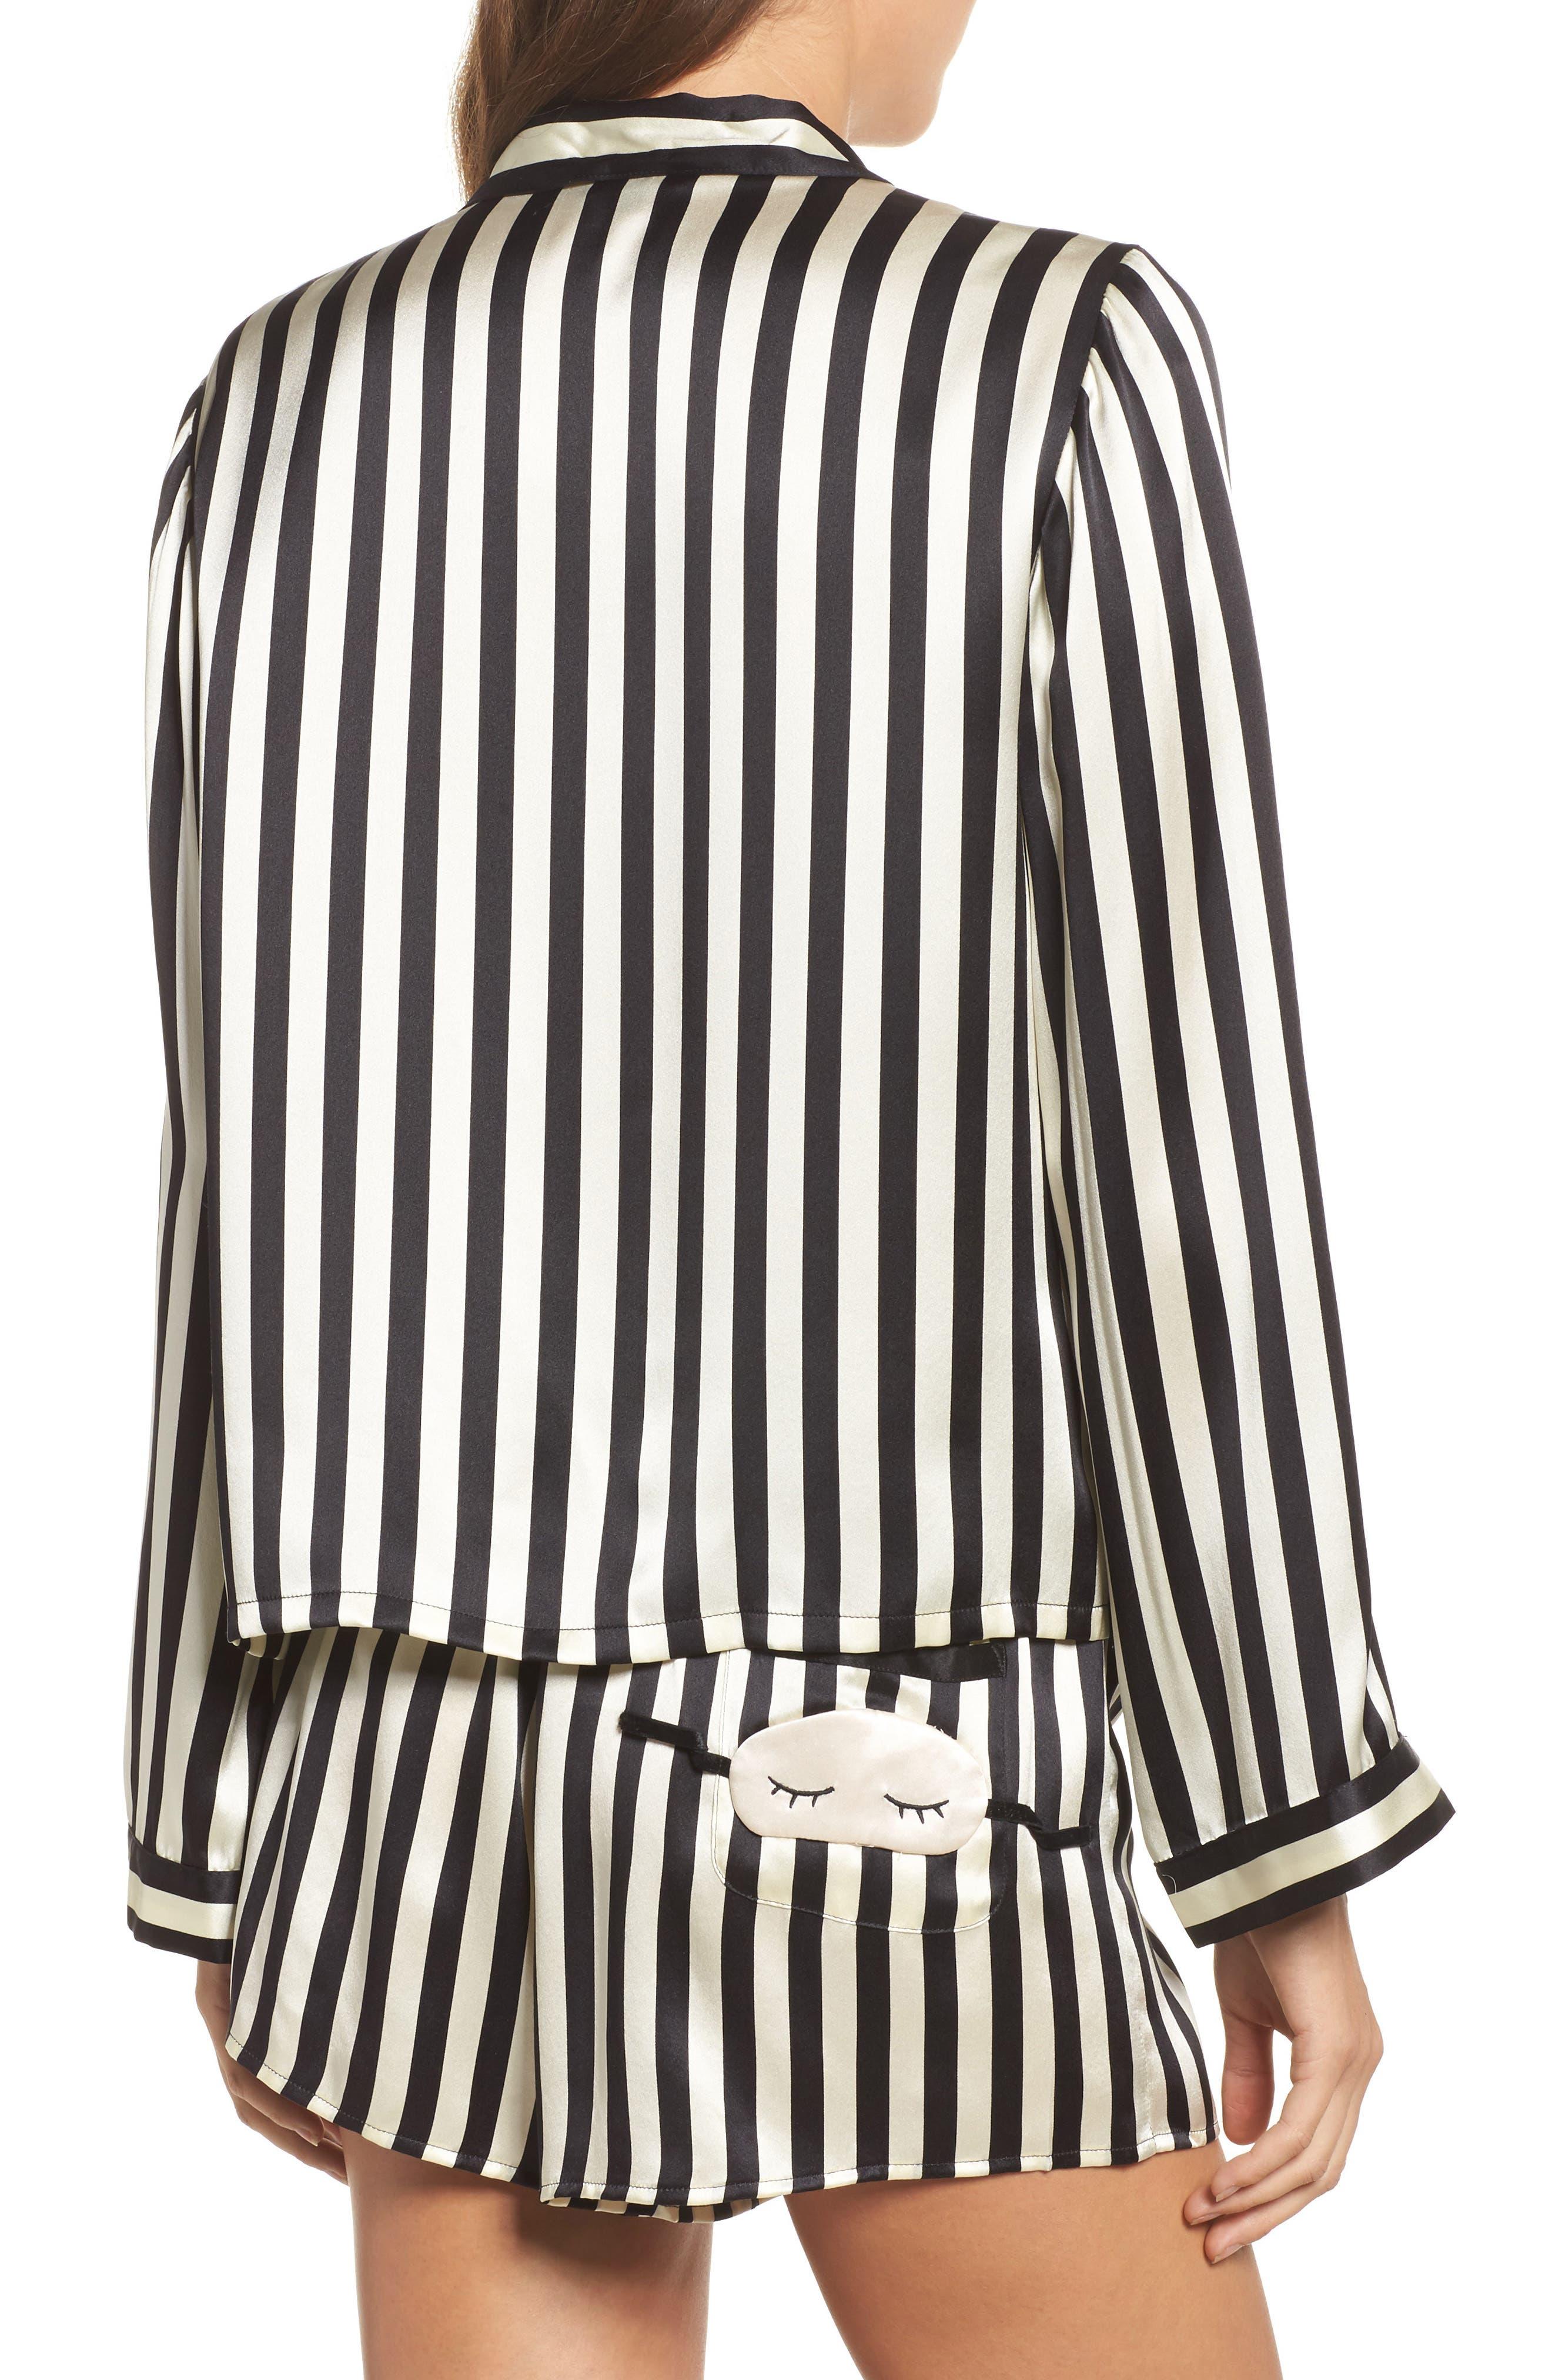 x Amanda Fatherazi Ruthie Mini Mask Stripe Pajama Top,                             Alternate thumbnail 2, color,                             Noir/ Ecru